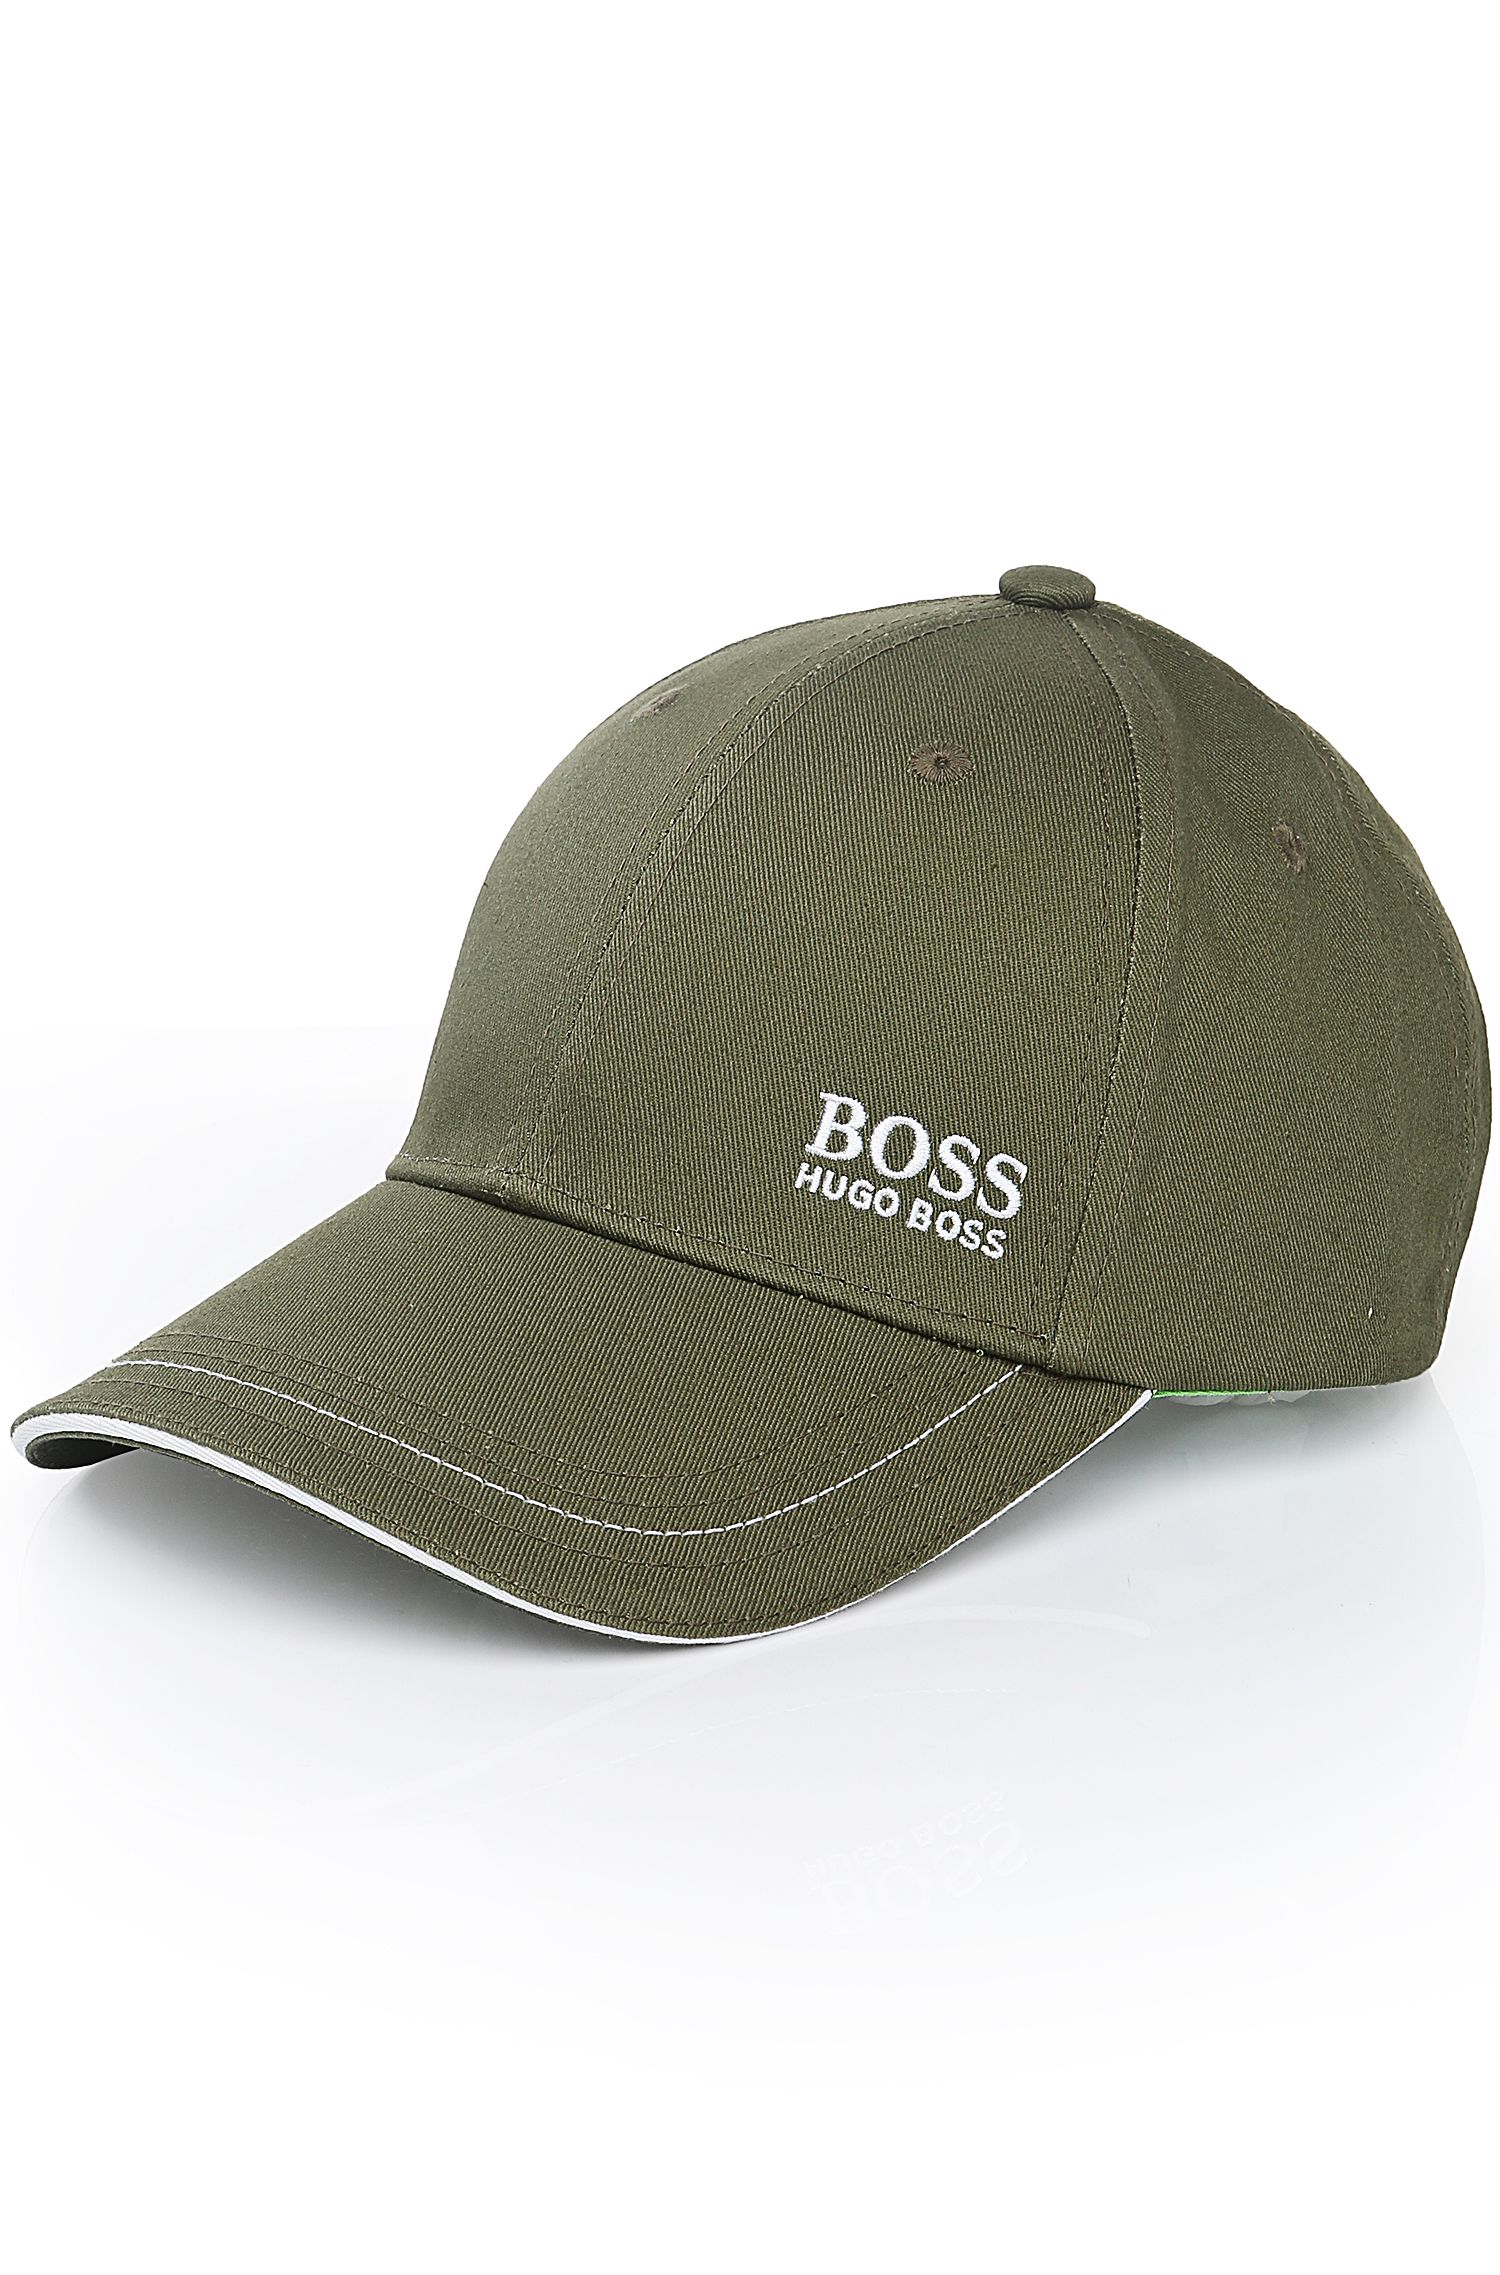 Cotton Twill Hat | Cap